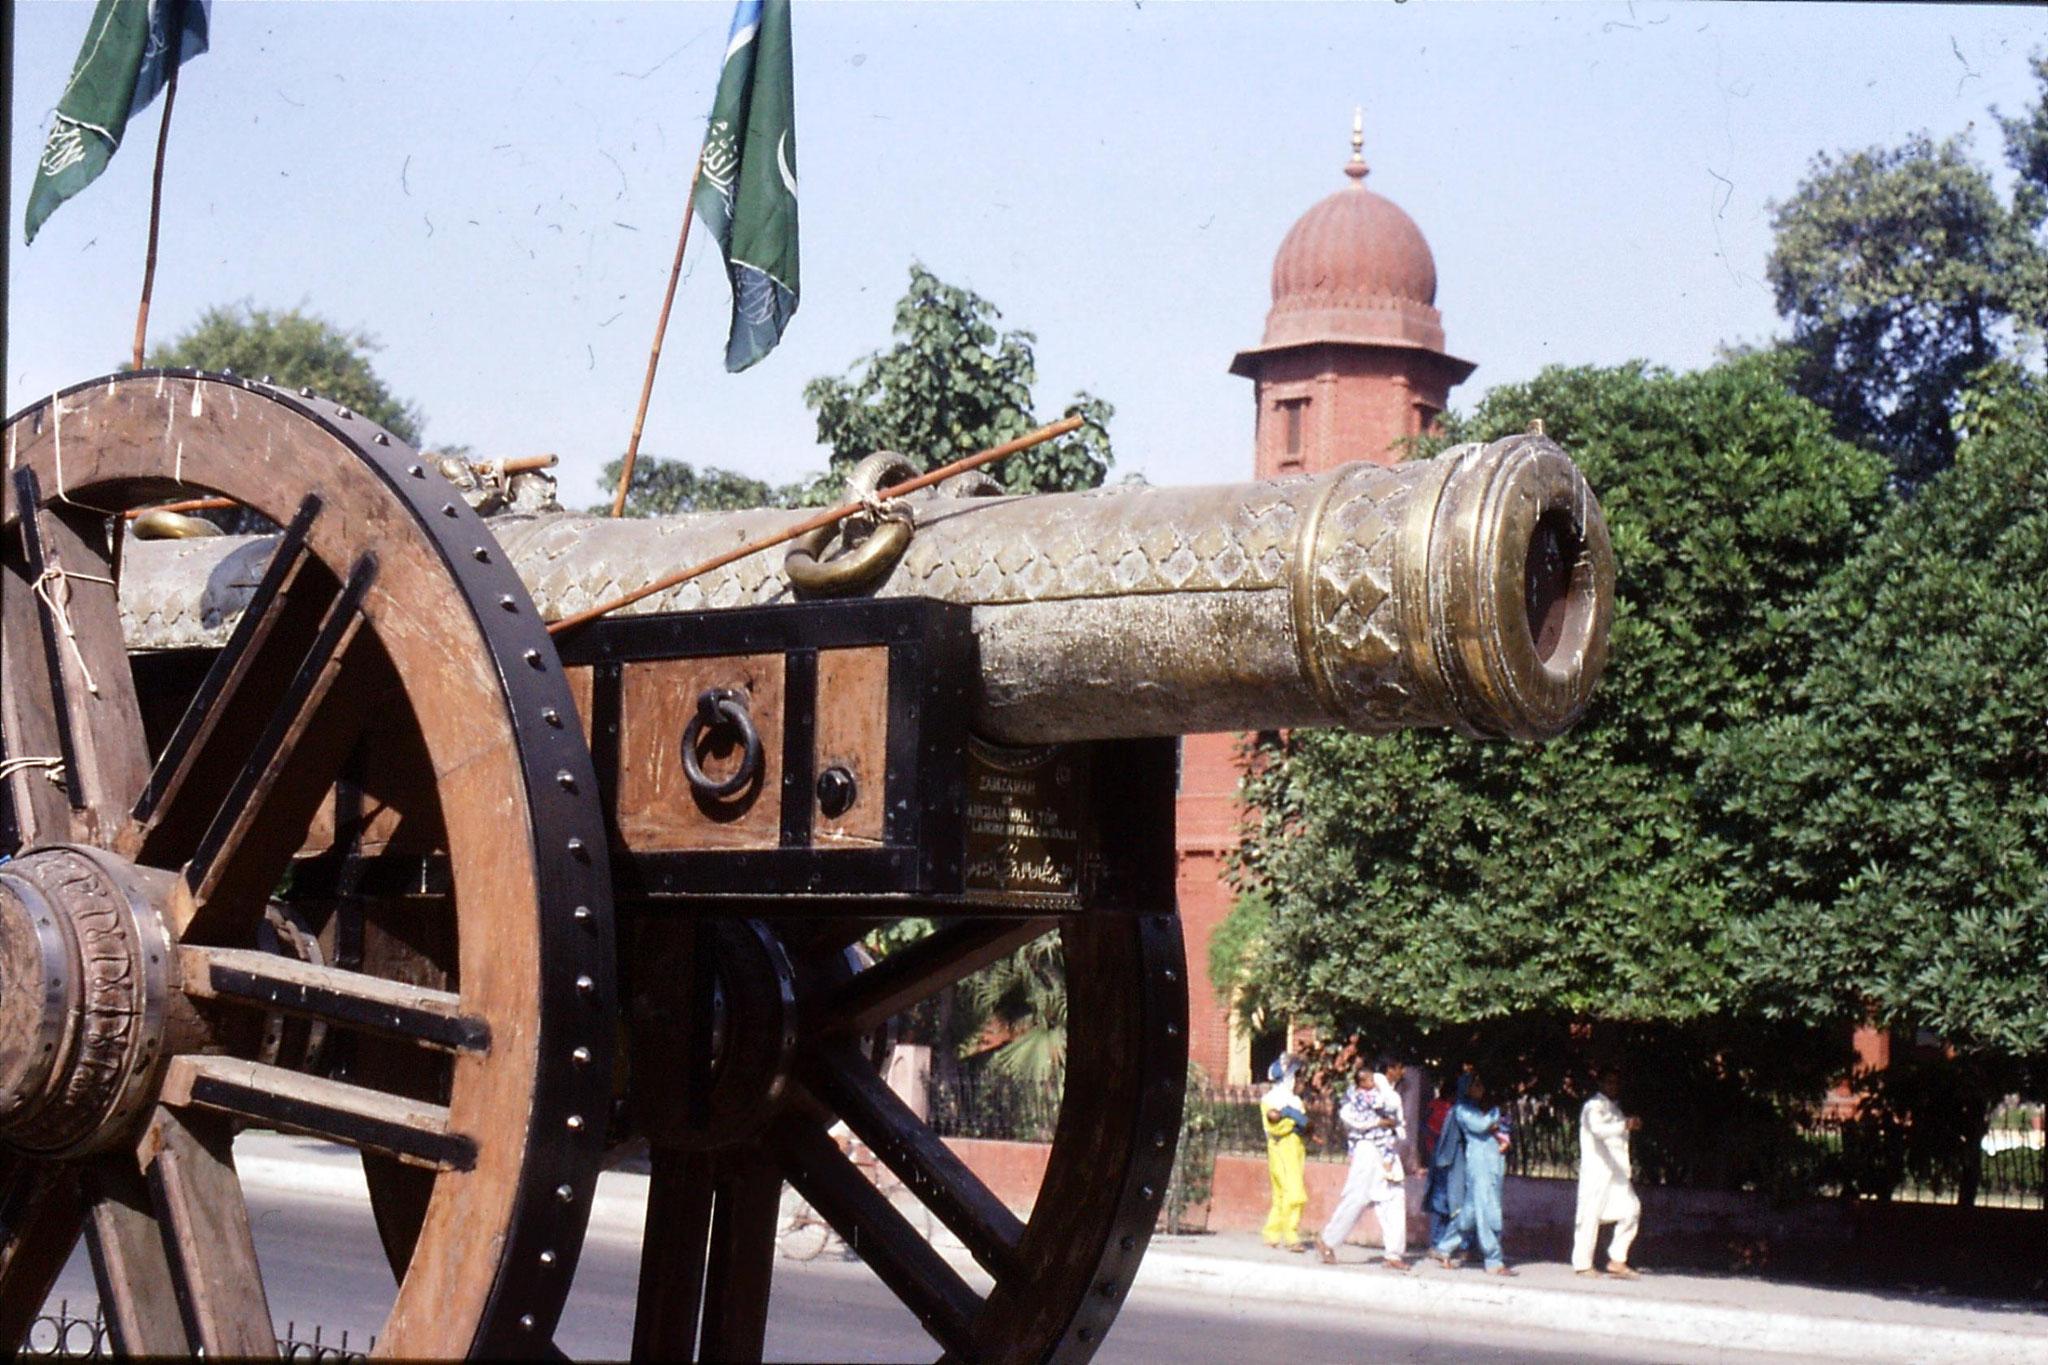 10/11/1989: Lahore, Kim's gun